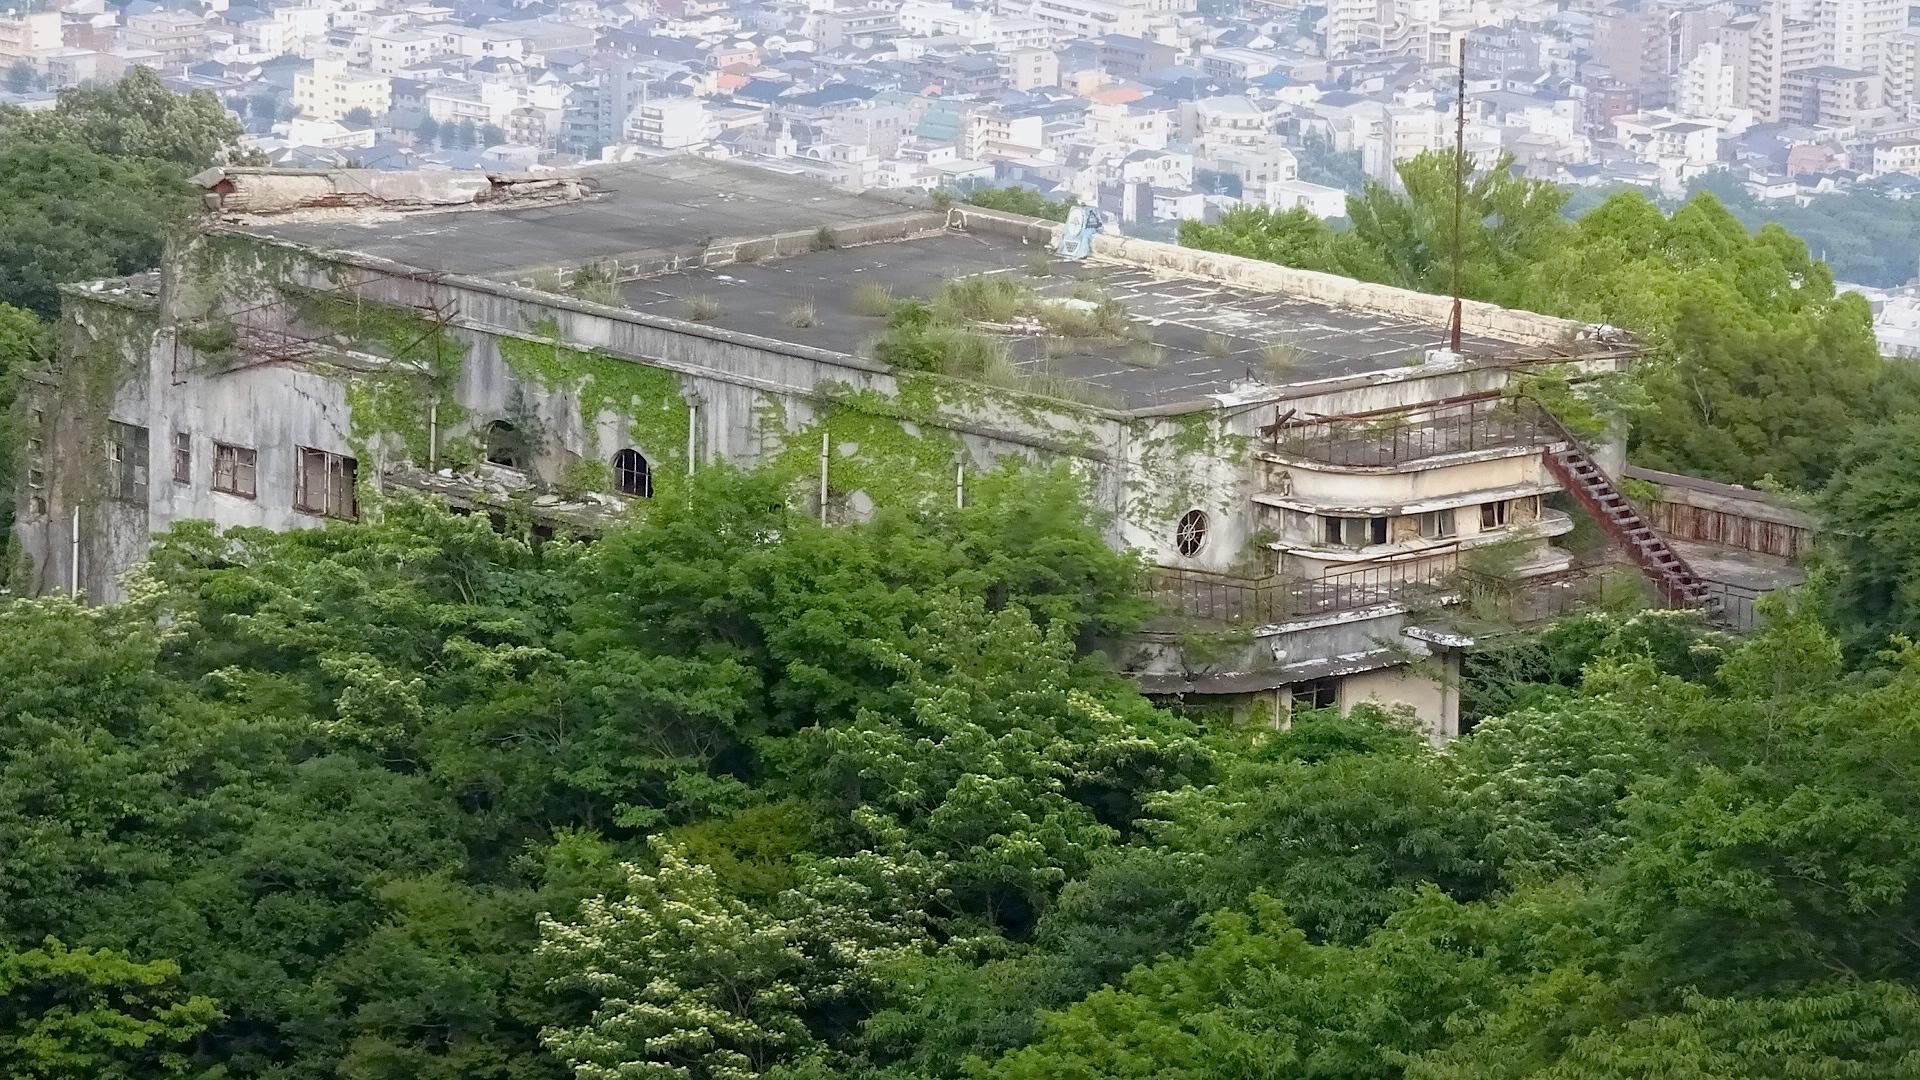 https://cdn-ak2.f.st-hatena.com/images/fotolife/s/shioshiohida/20170623/20170623175251_original.jpg